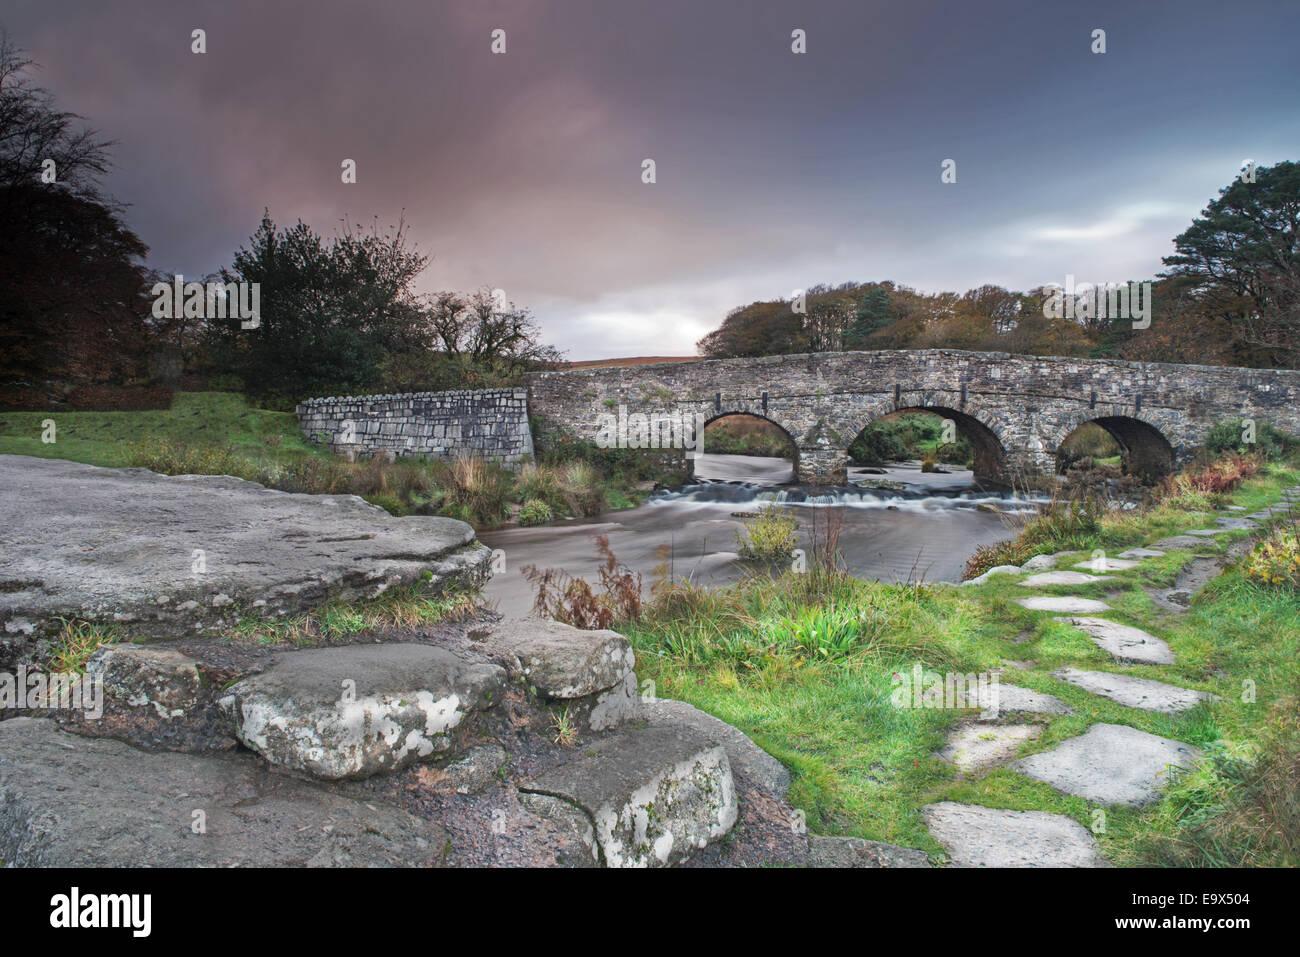 Clapper Bridge at Postbridge on the East Dart River. Dartmoor National Park,  Devon, England, Uk - Stock Image